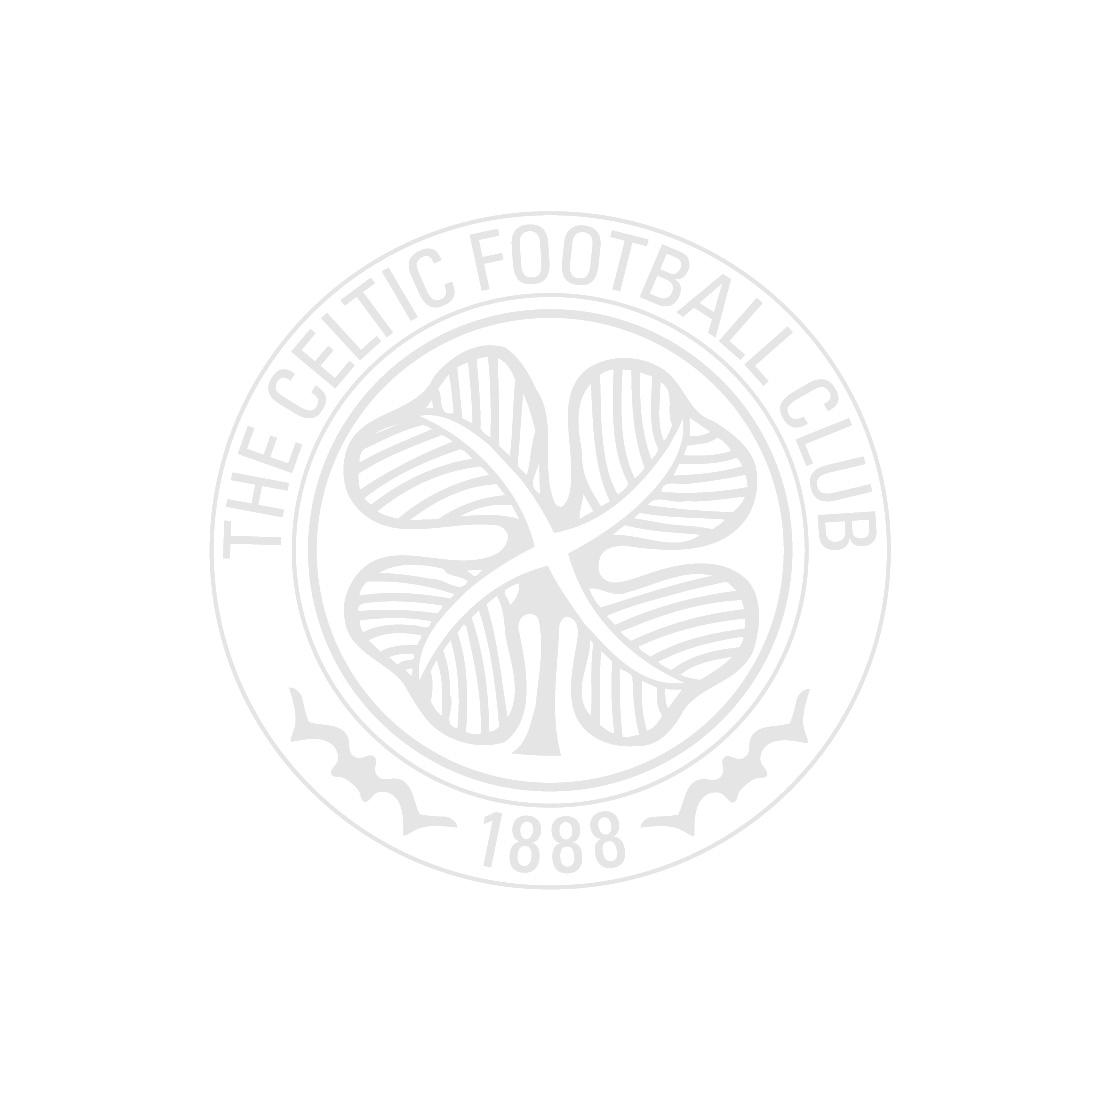 Celtic 3 in 1 Torch Keyring